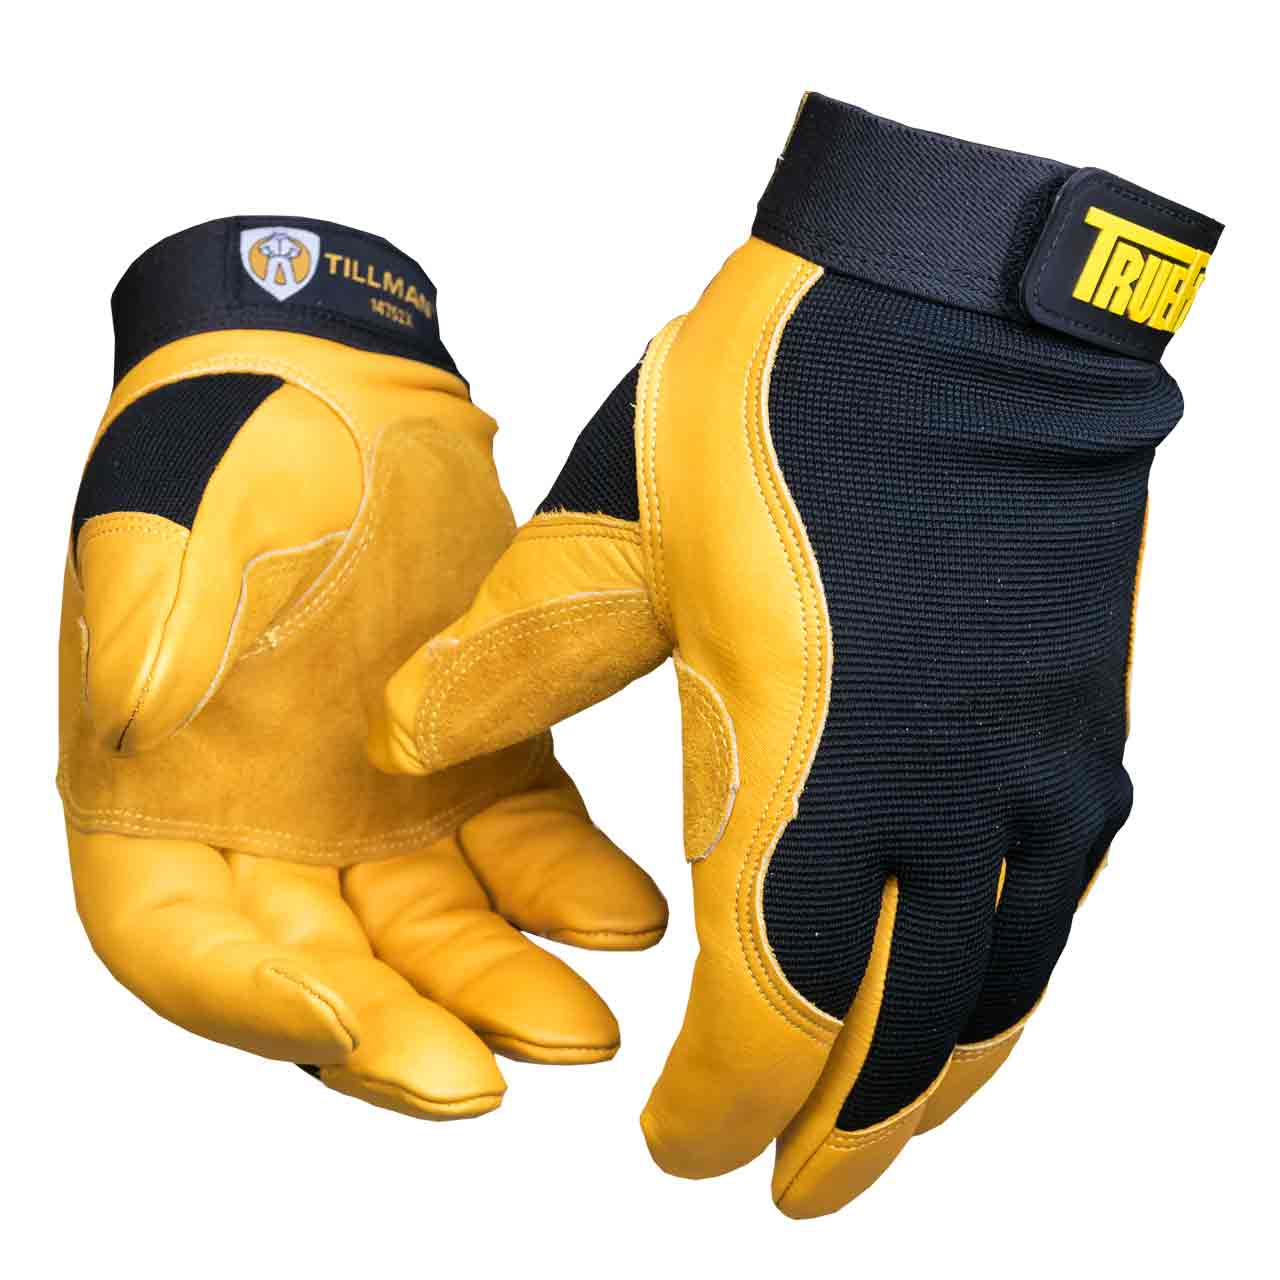 Tillman 1475 True Fit Premium Top Grain Cowhide Perform. Work Gloves, Large